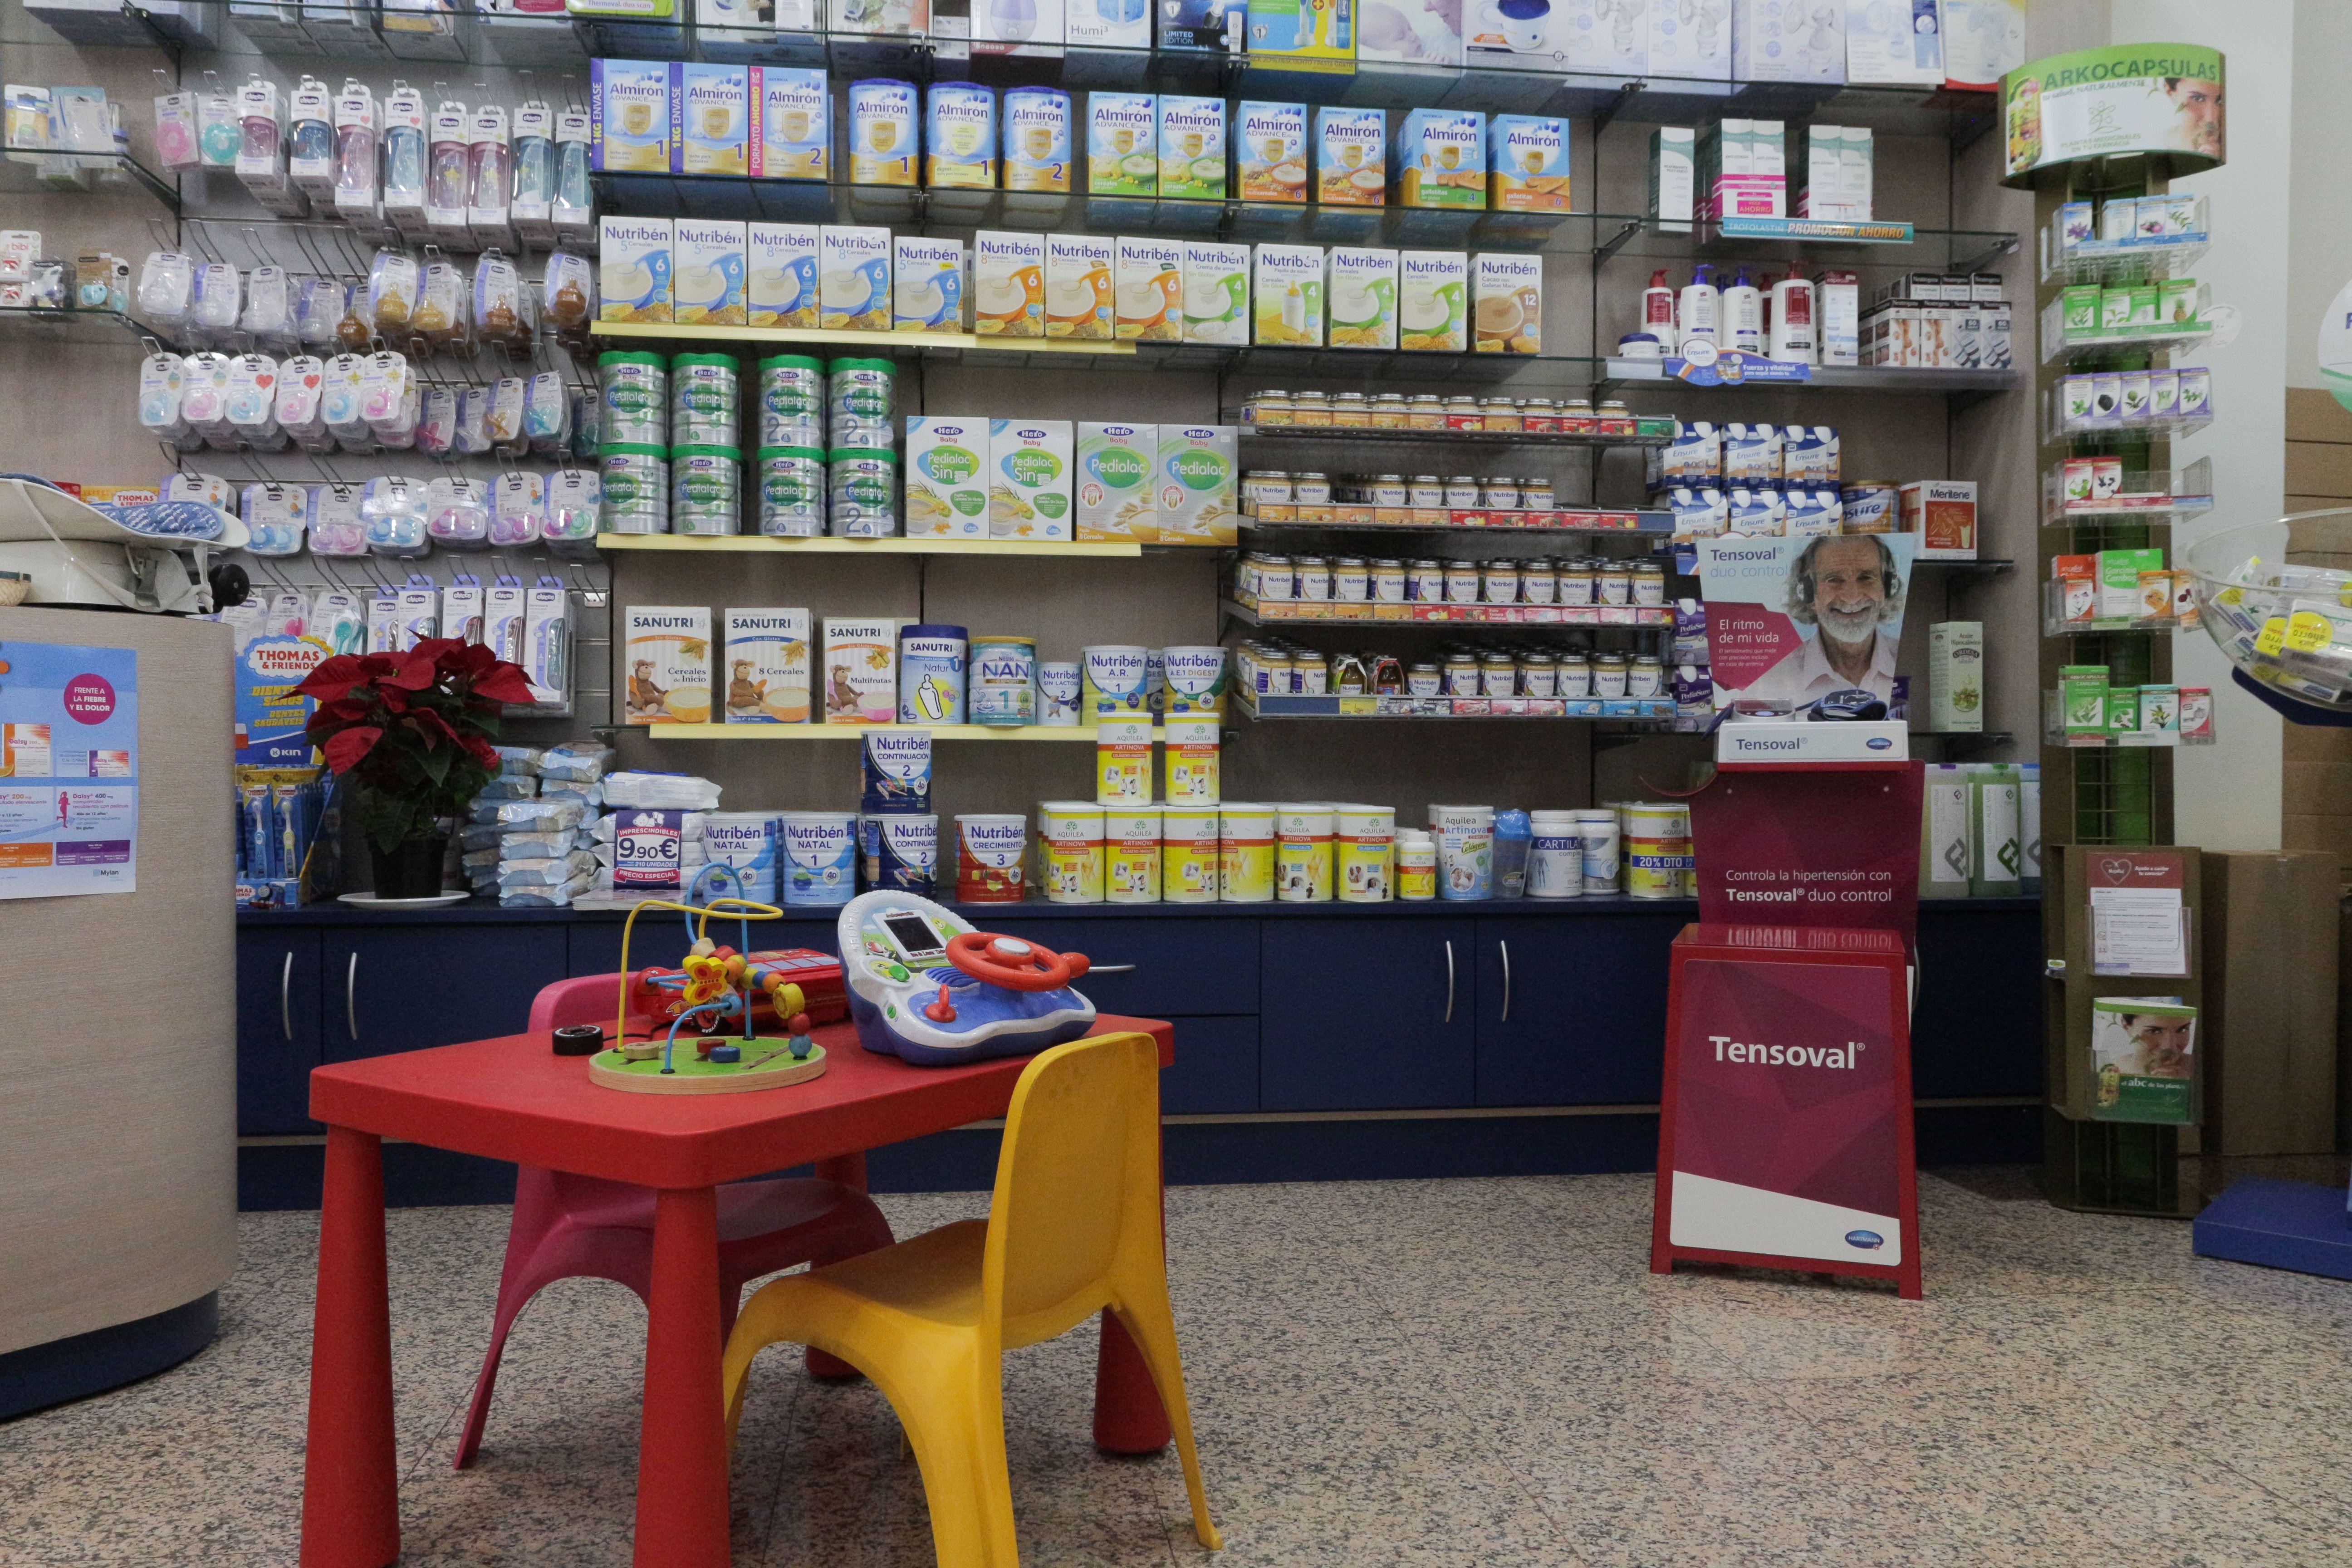 Foto 6 de Farmacias en Torrejón de Ardoz | Farmacia Budapest - Multiópticas Loreto